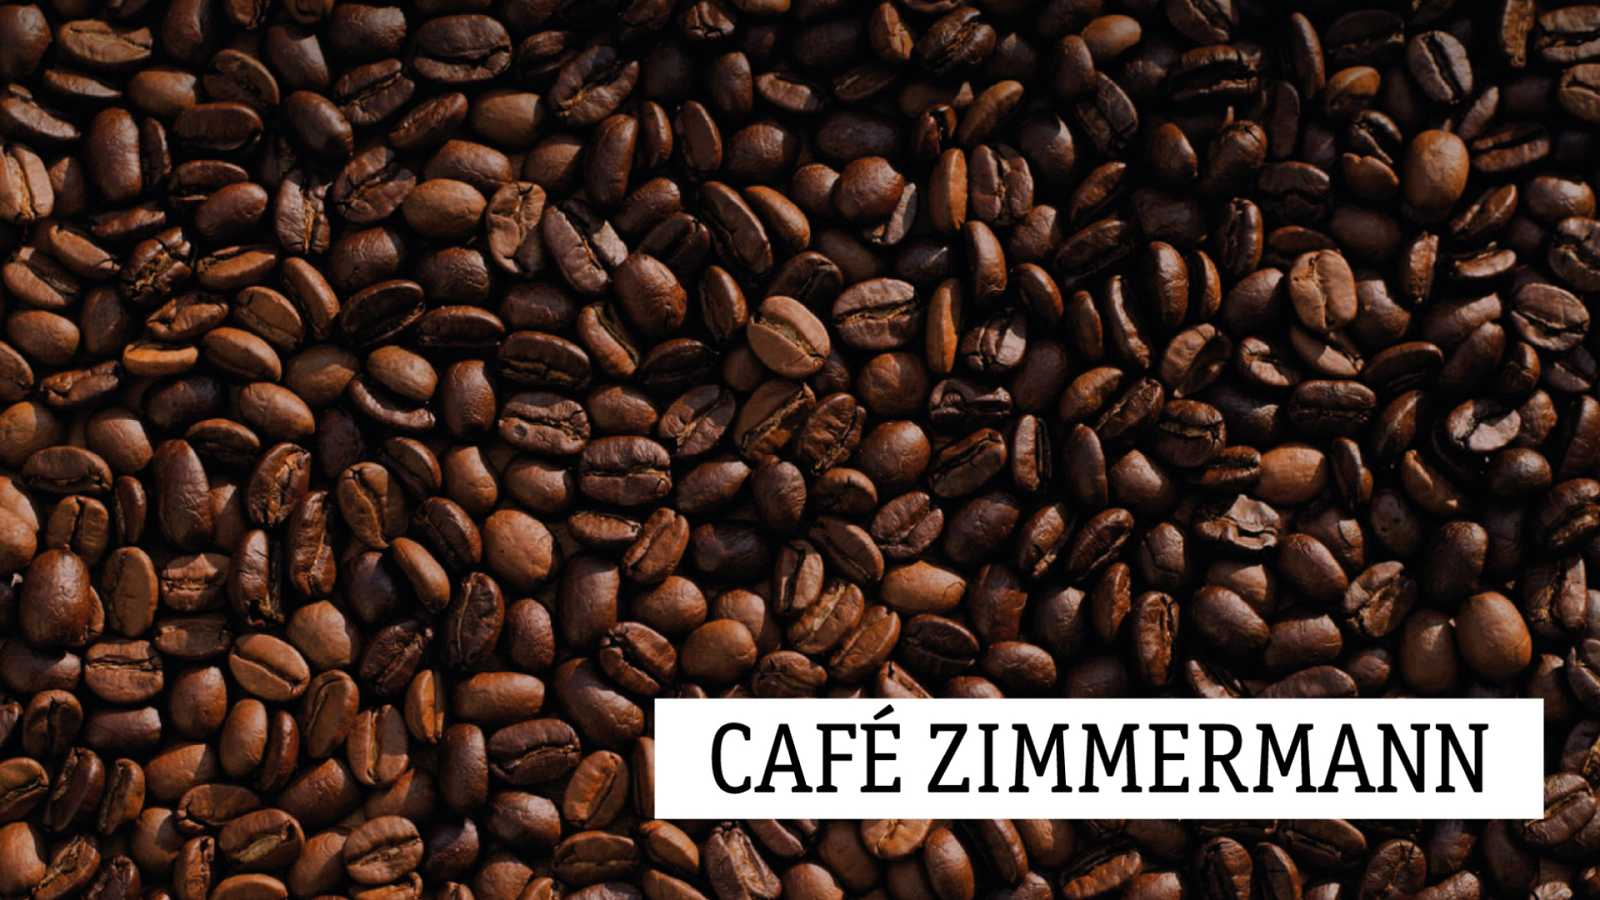 Café Zimmermann - Los códices de Leonardo da Vinci - 08/04/21 - escuchar ahora